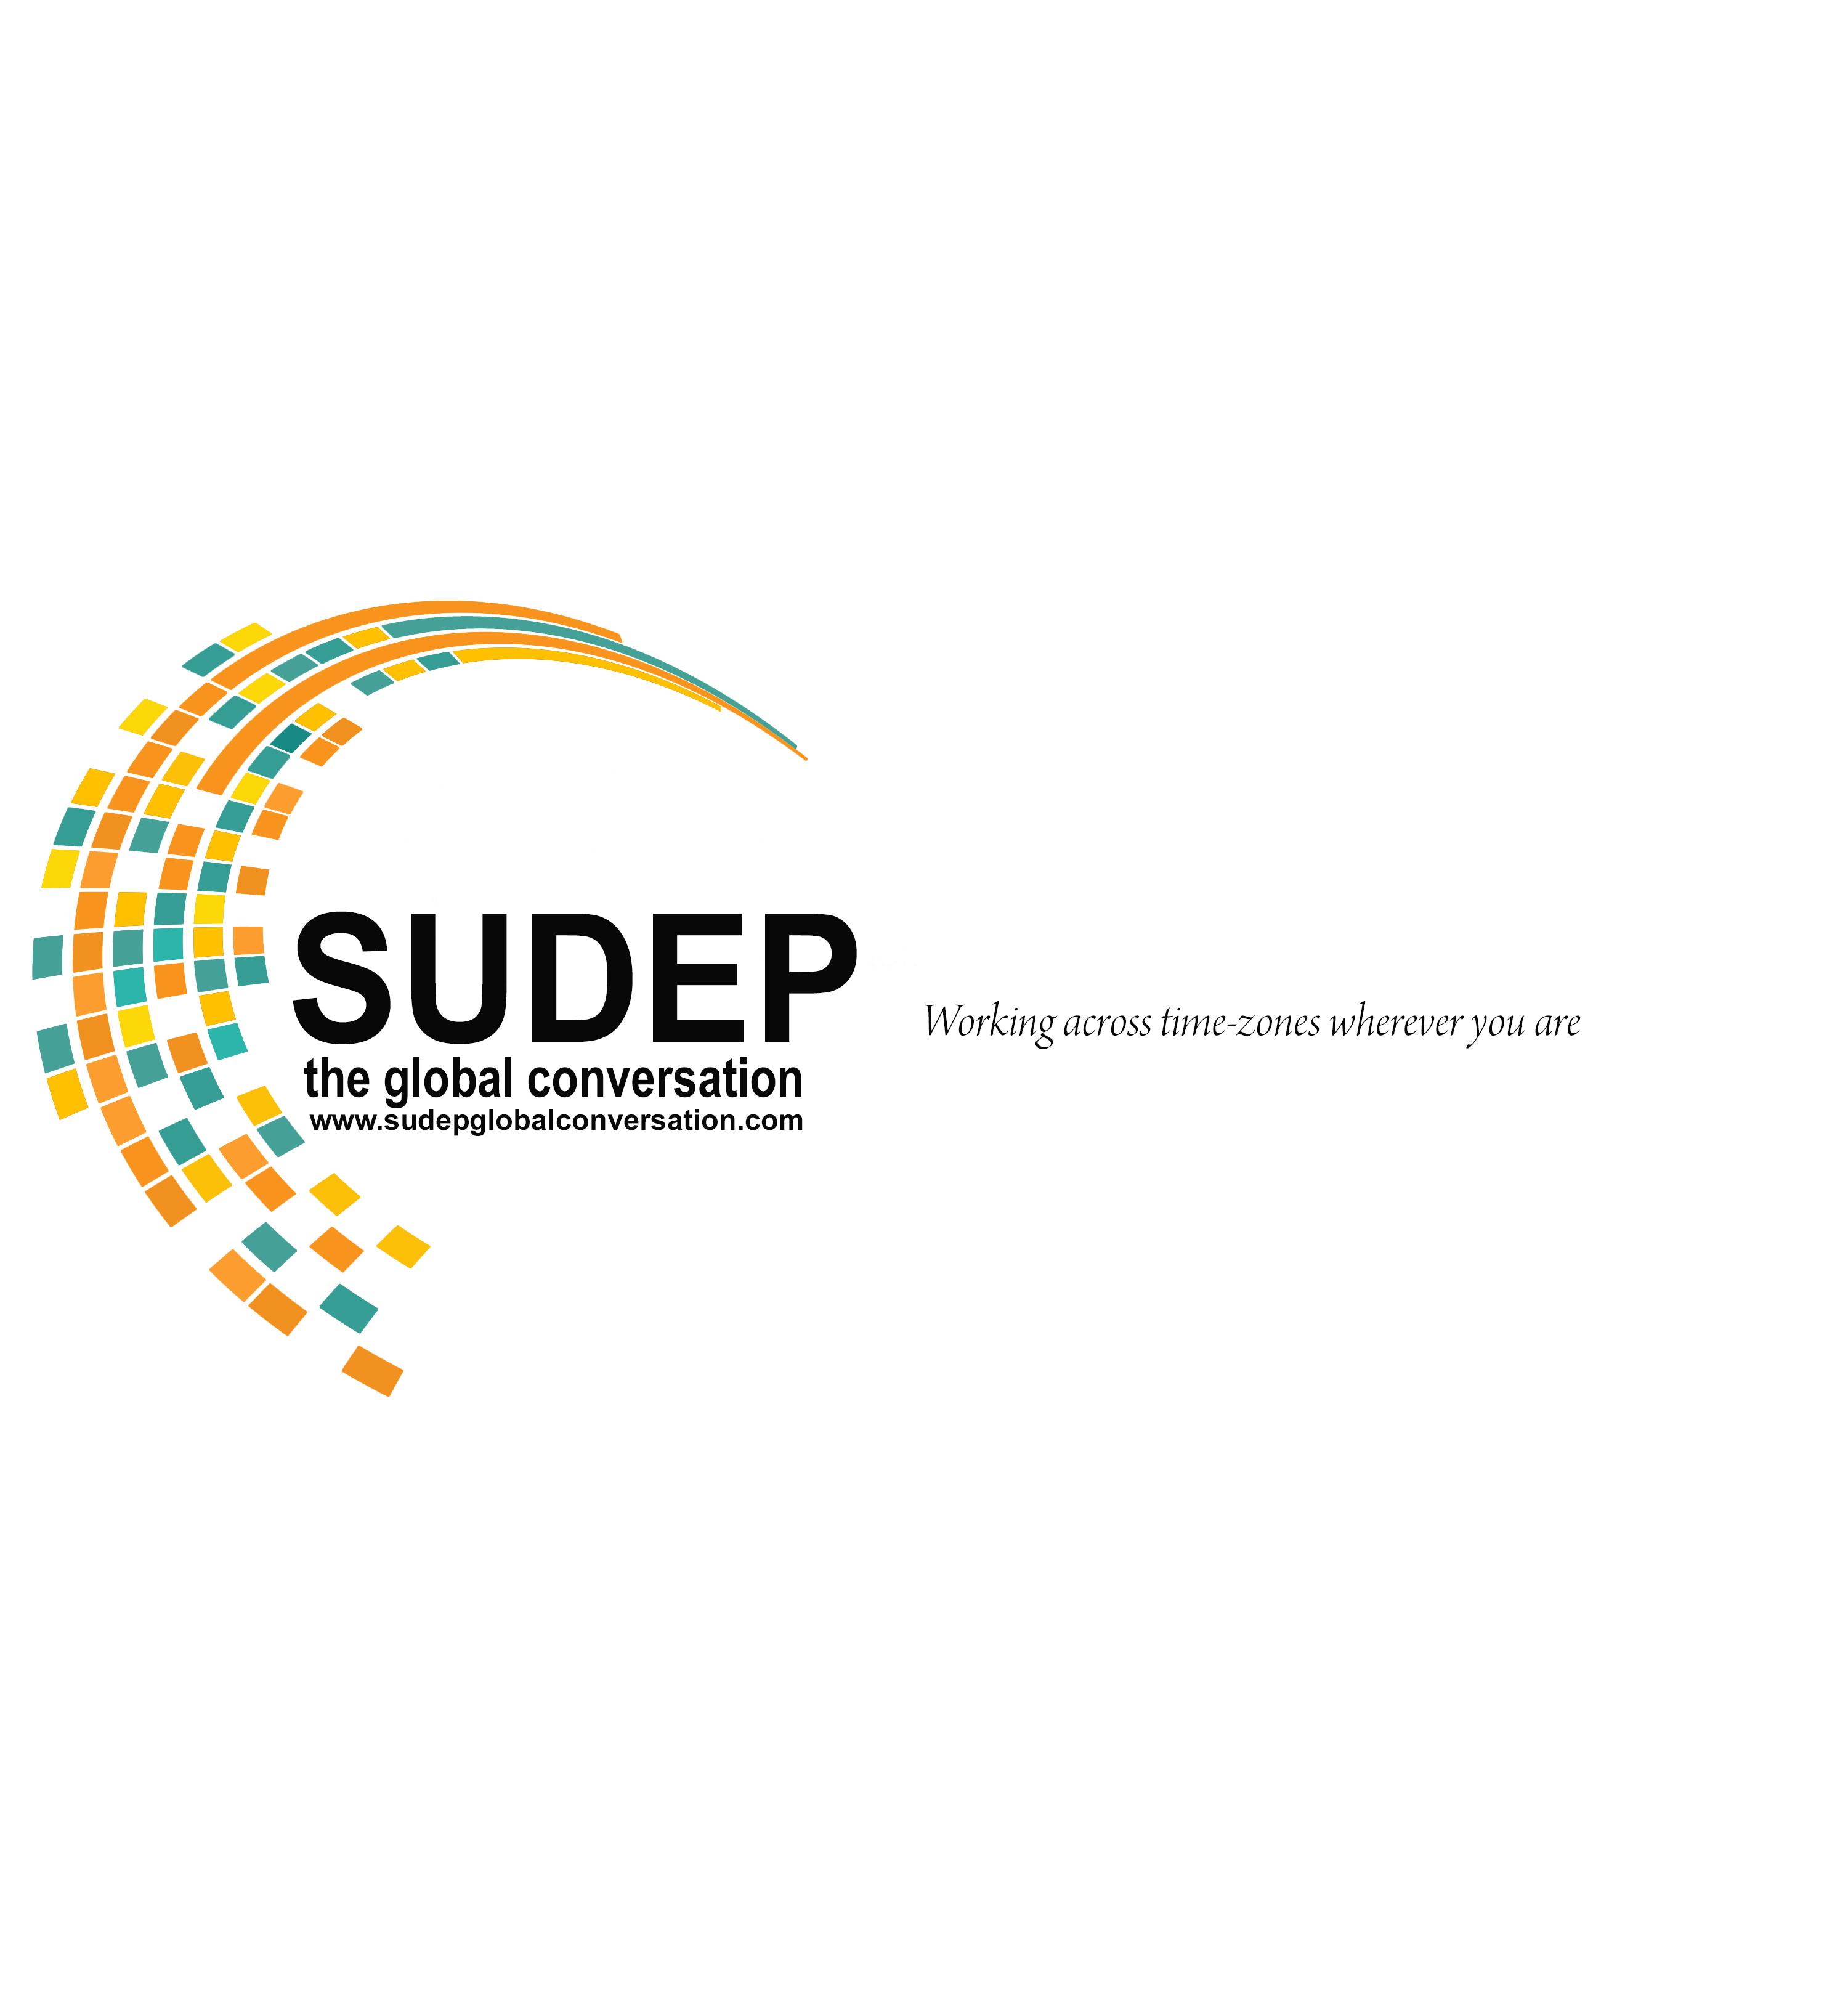 SUDEP timezones_wix.jpg